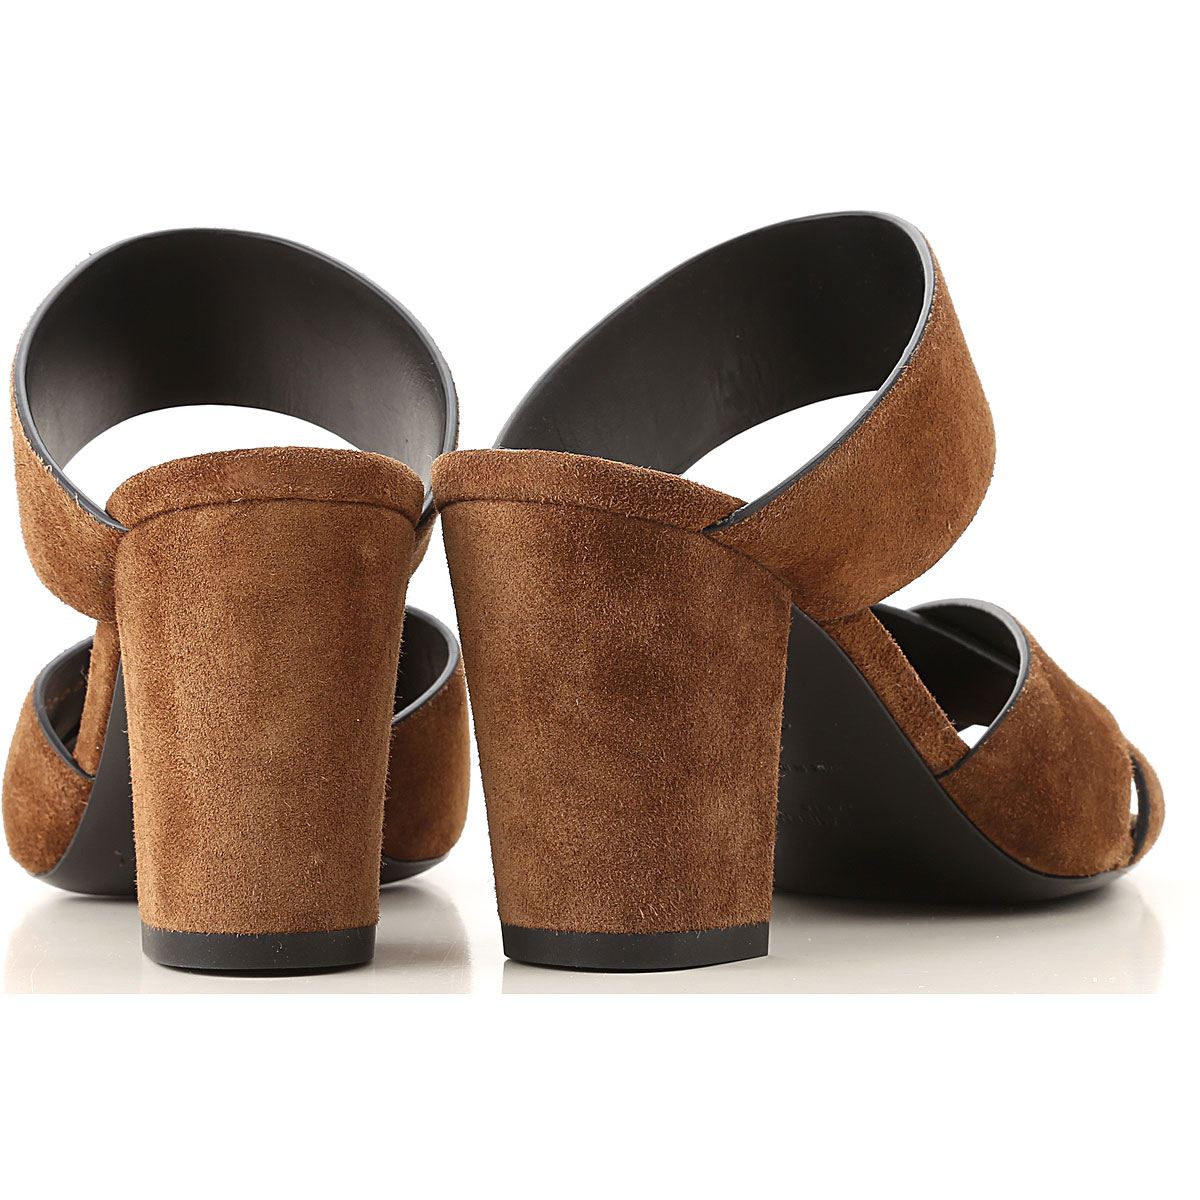 Laurent Primavera 2019 Mujer Zapatos Saint verano Para nbsp; Land PpAqBdww